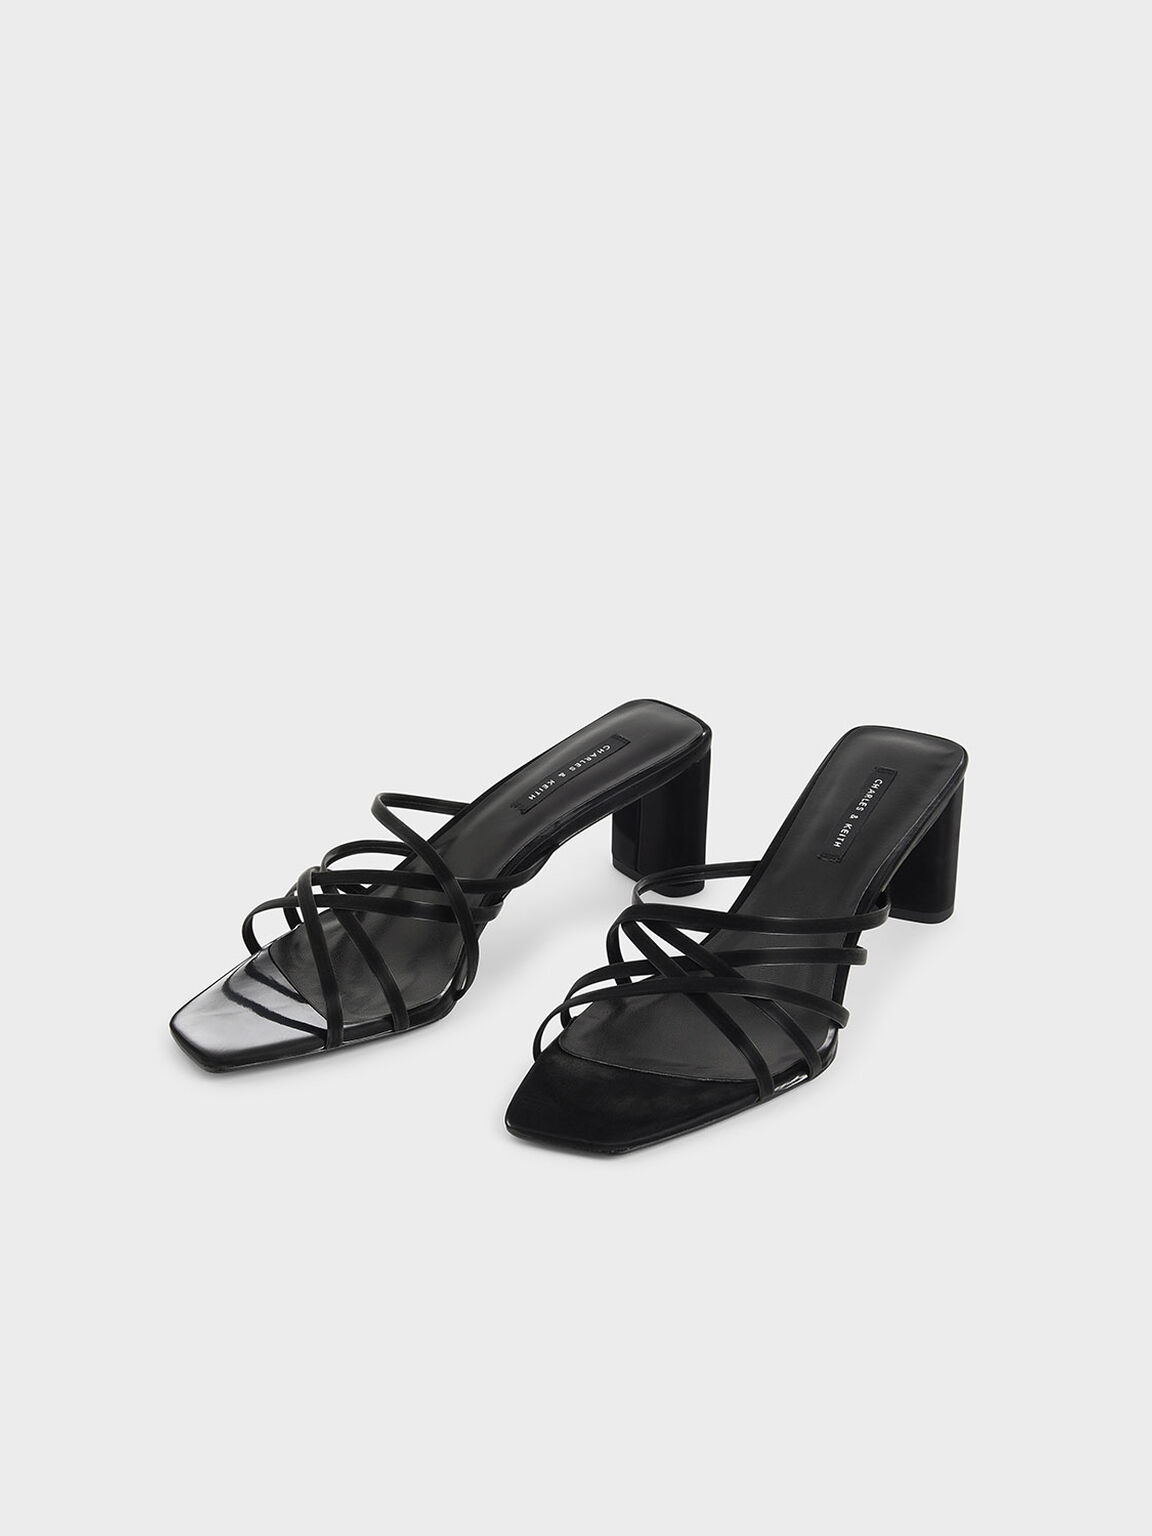 Sandal Strappy Blade Heel Mules, Black, hi-res